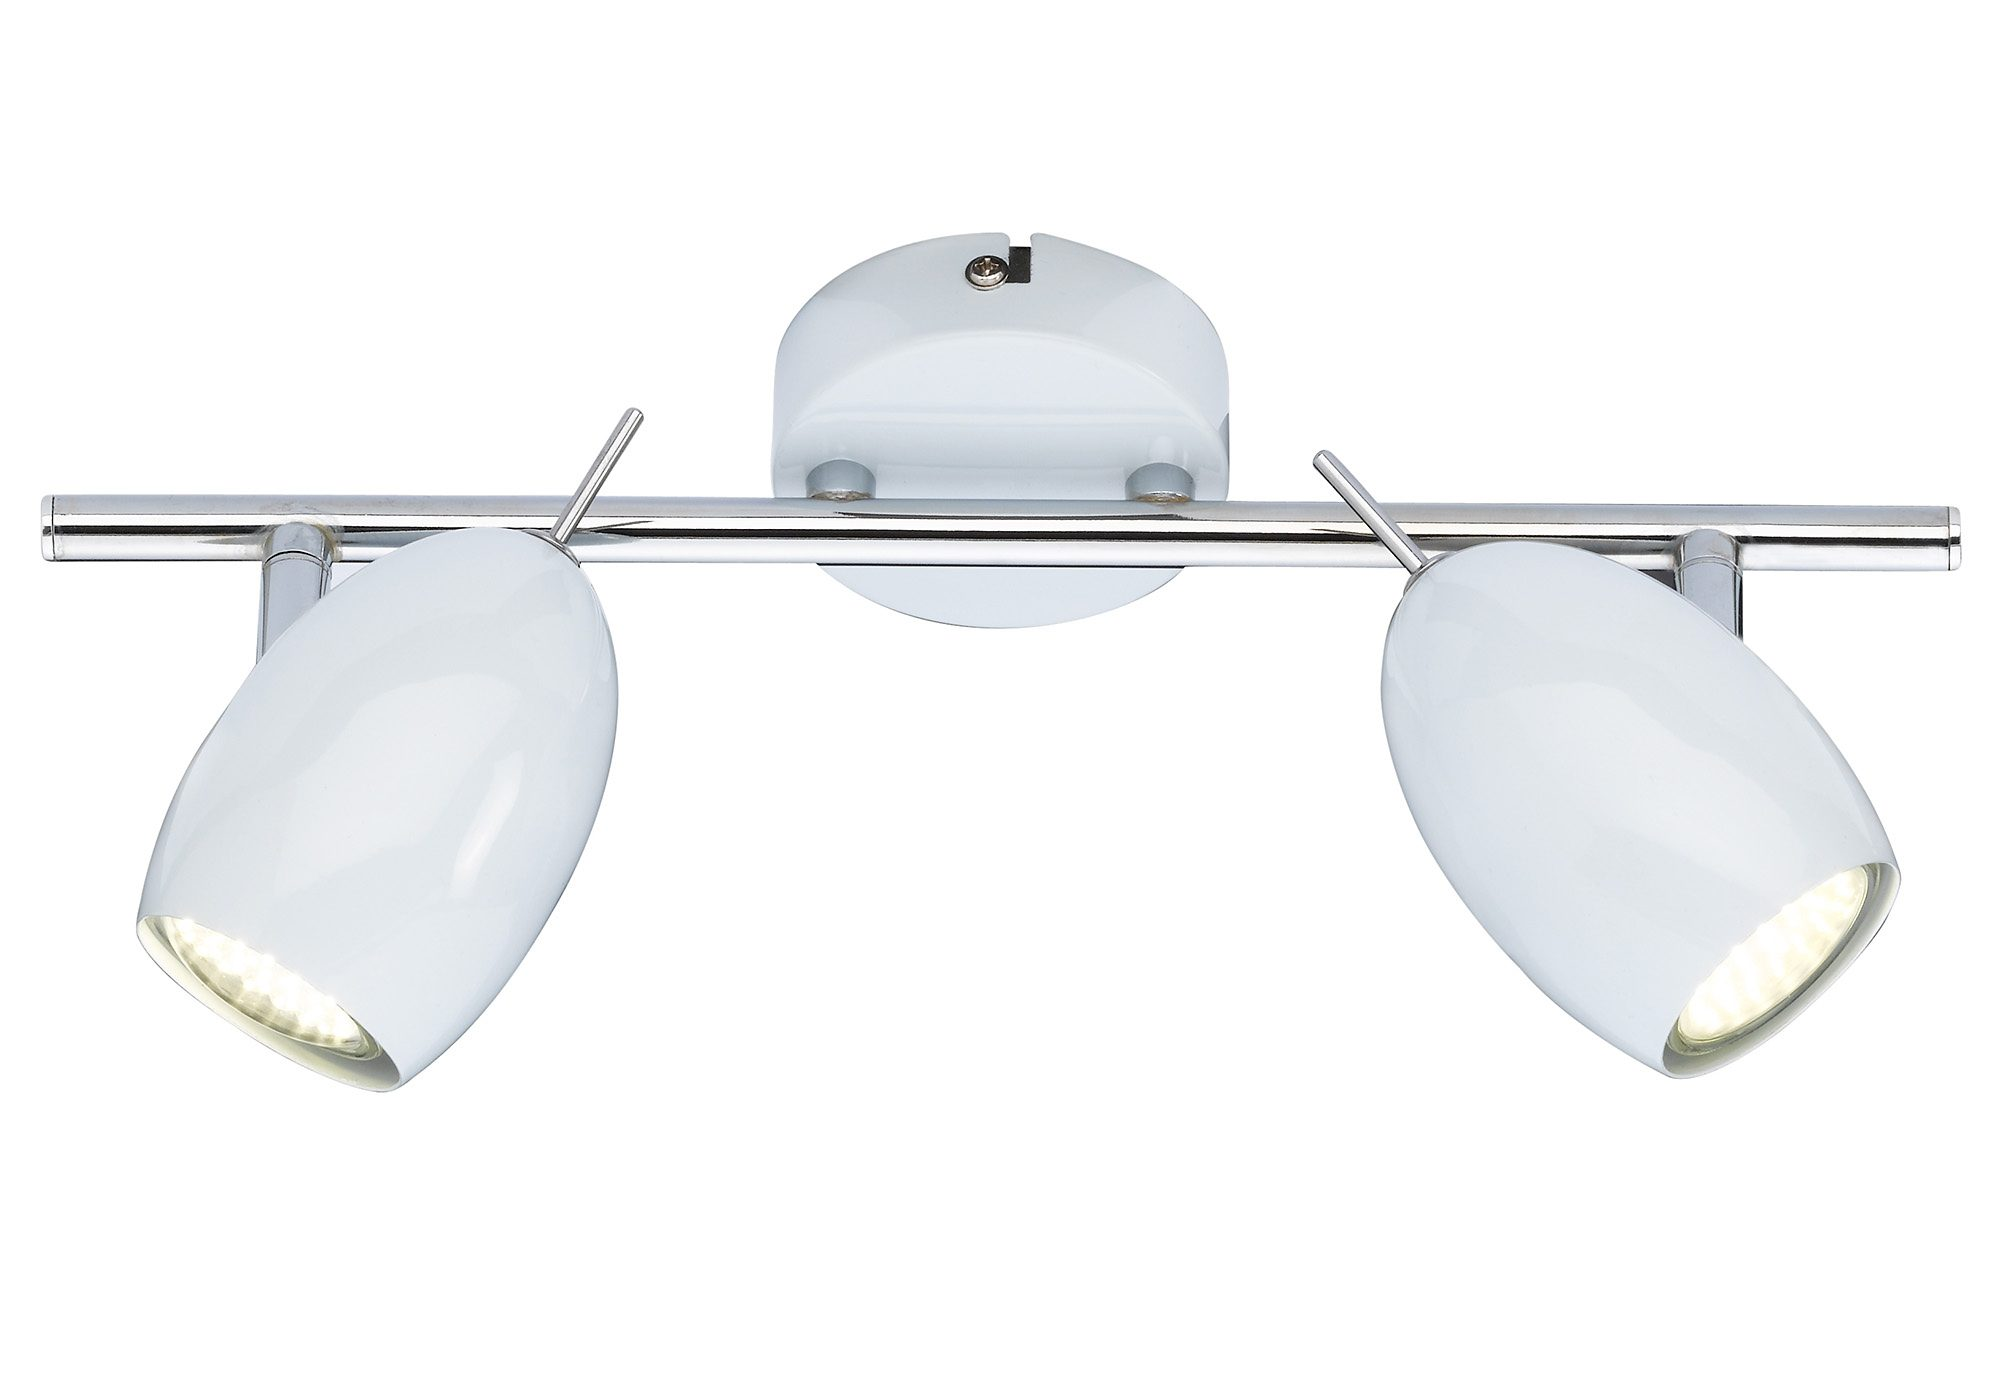 WOFI LED Deckenstrahler QUINCY